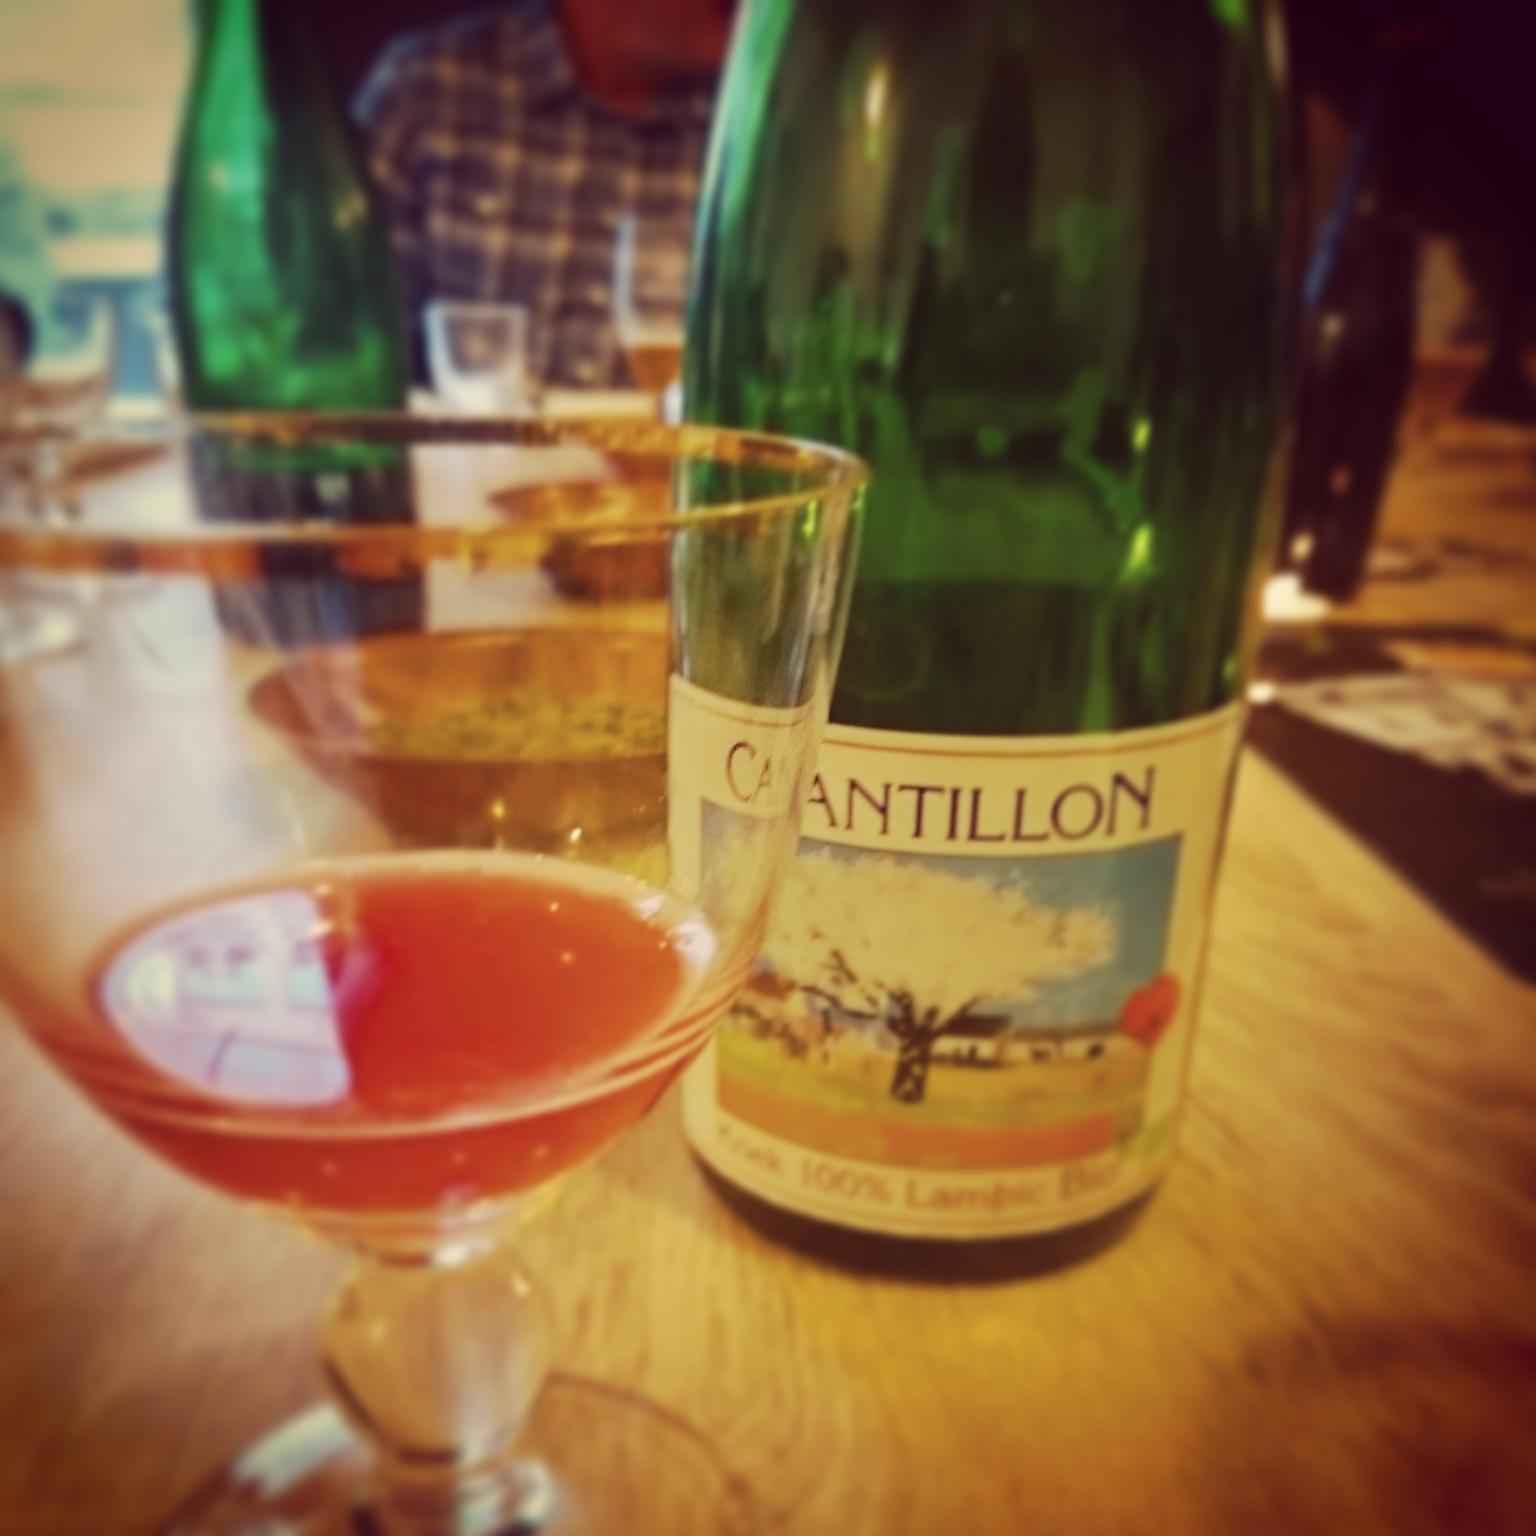 Cantillon Kriek.jpg